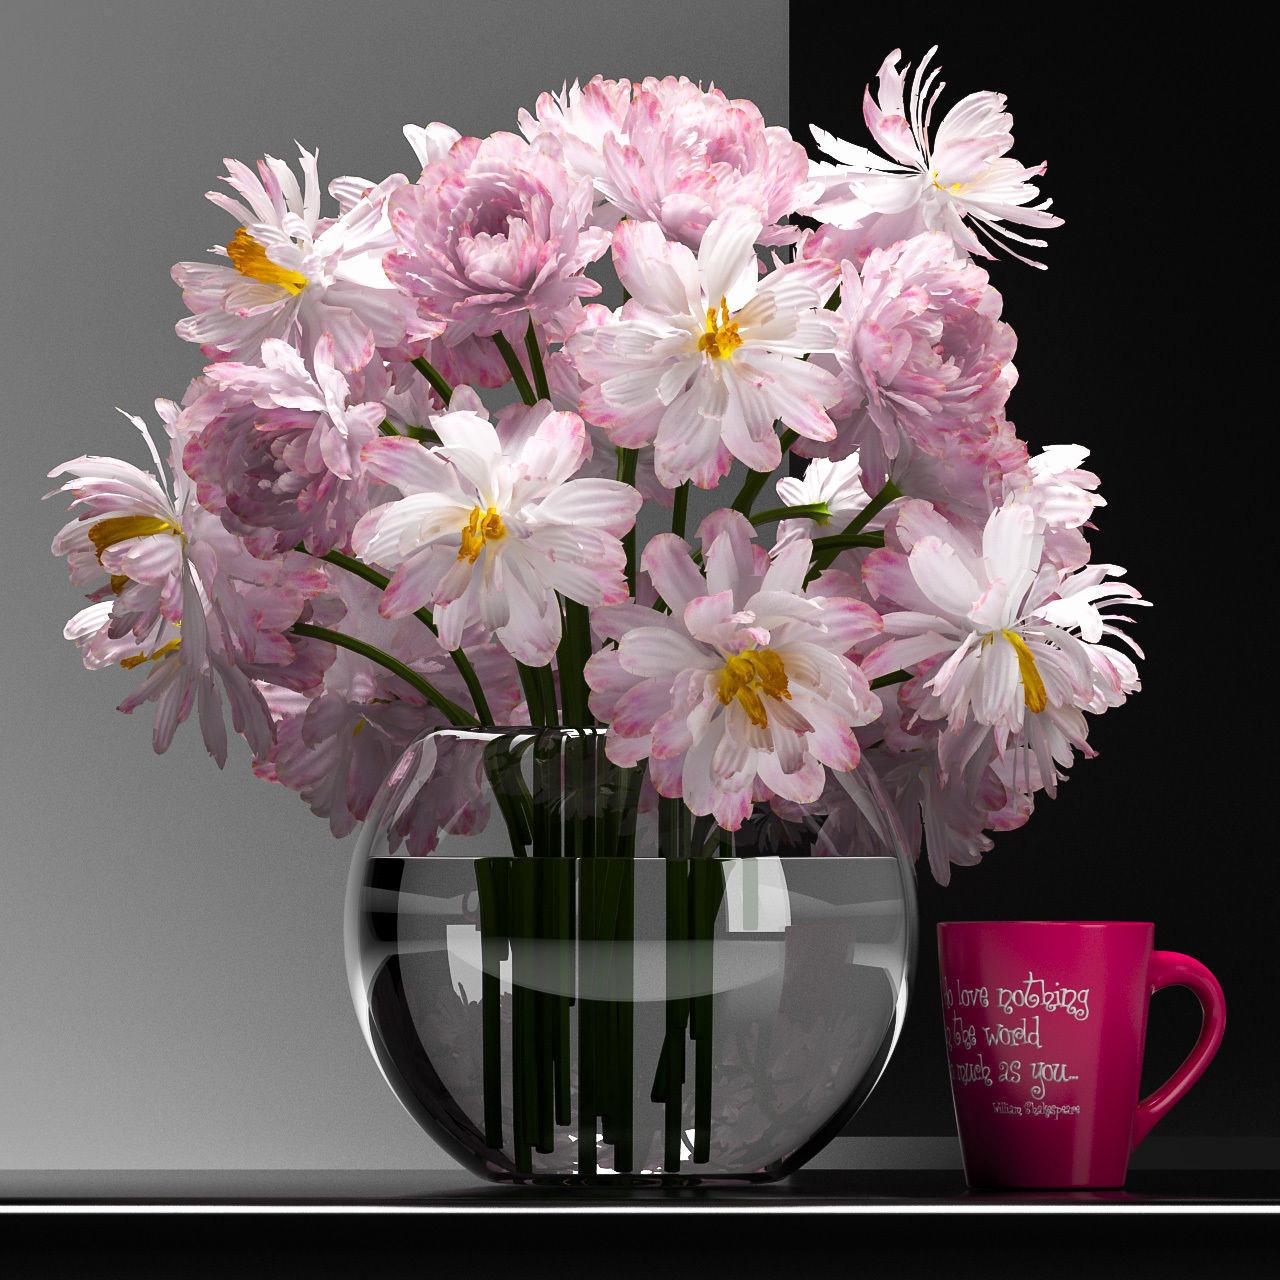 tall vase flower arrangements of flowers around the world best of tall vase centerpiece ideas vases with regard to flowers around the world best of wrh 20preview 2001h vases 3d flower vase preview 01 jpg